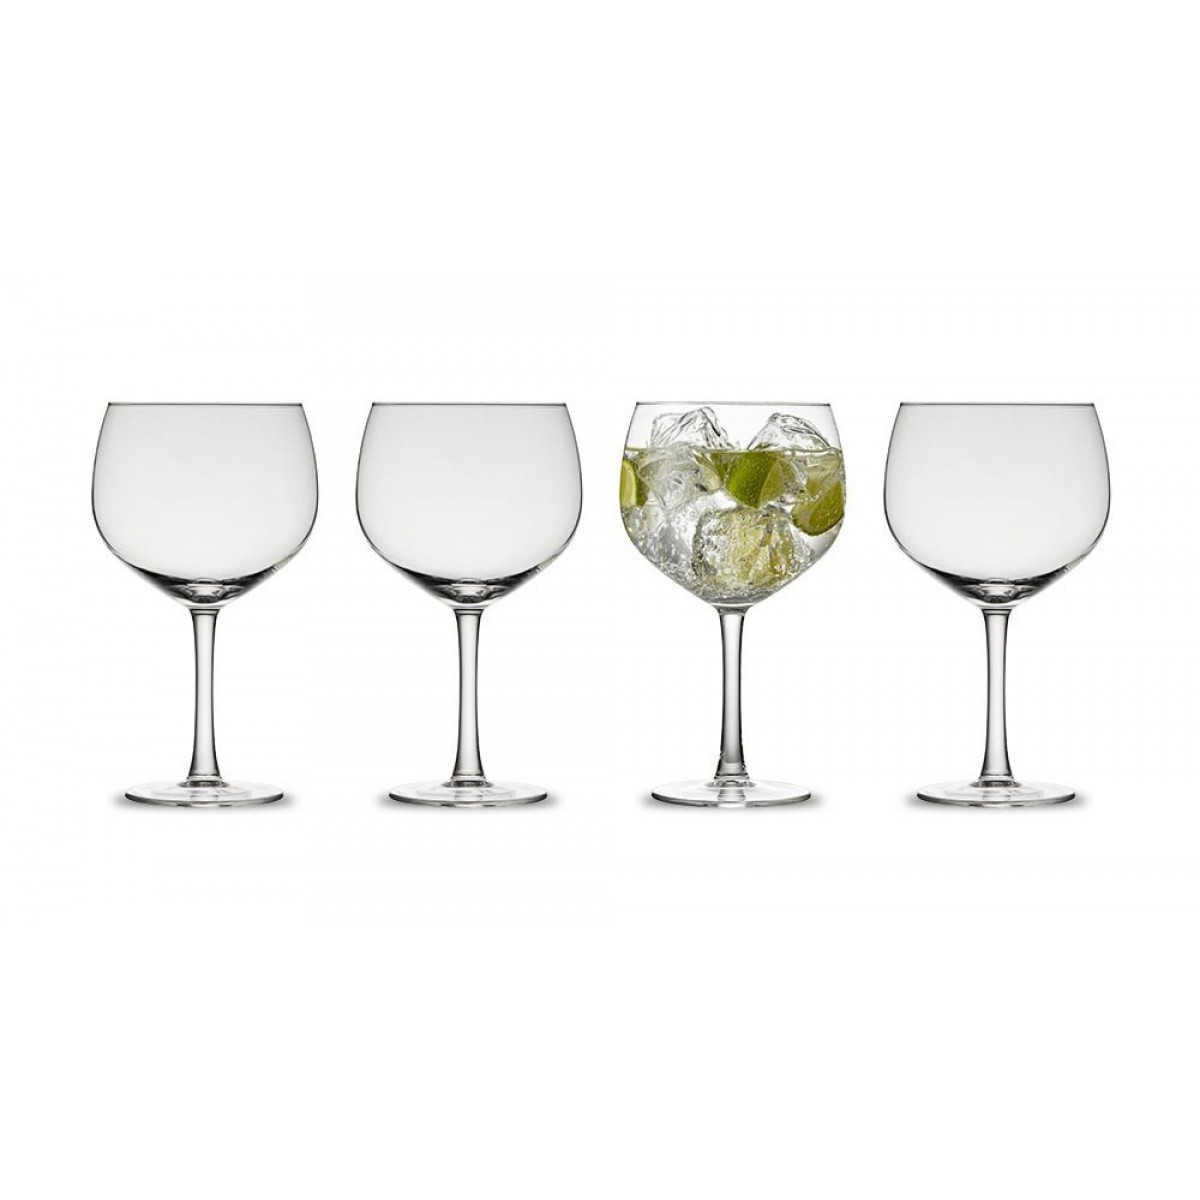 LYNGBY Juvel gin & tonicglas 57 cl 4 stk